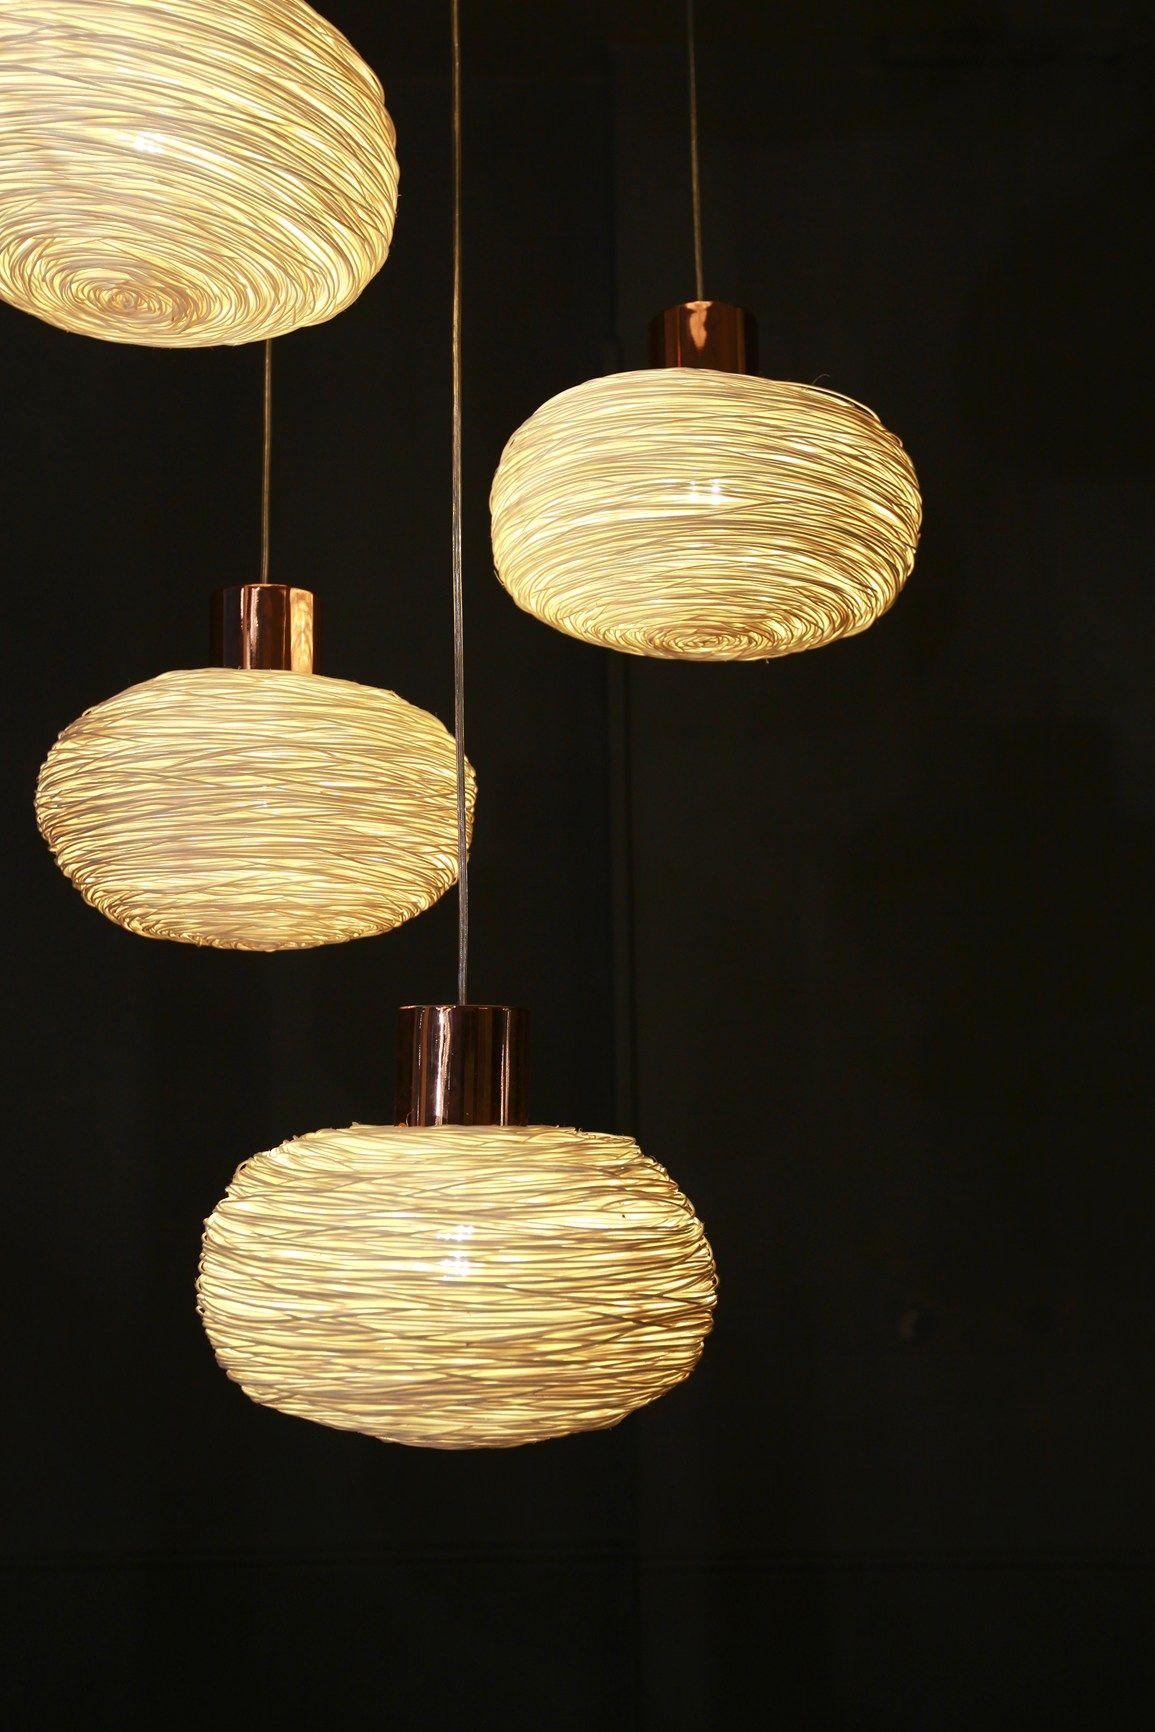 Ango jewelry lighting